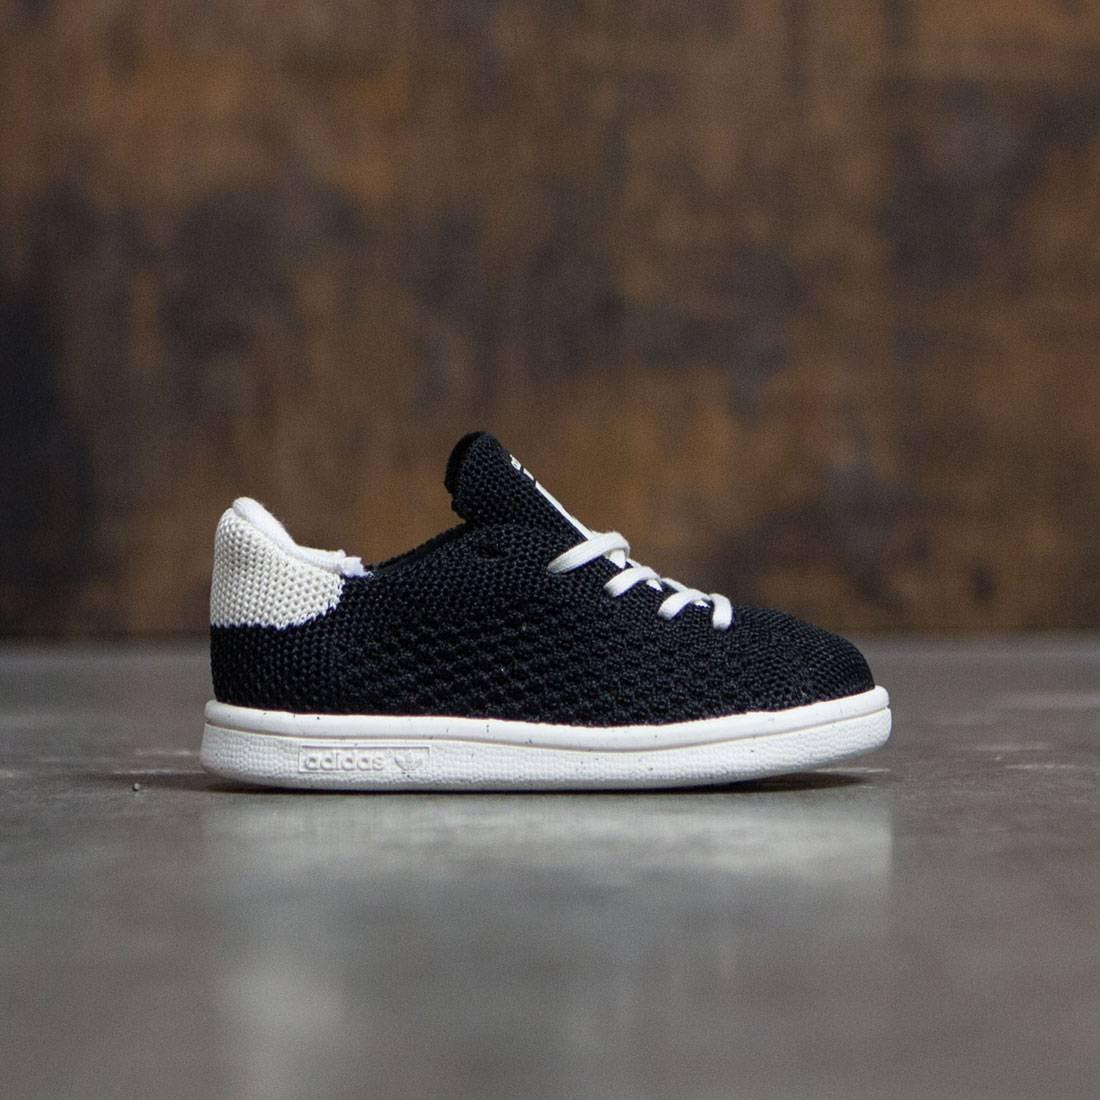 low priced e04b7 cdb50 Adidas Originals x Mini Rodini Toddlers Stan Smith PK (white / black)